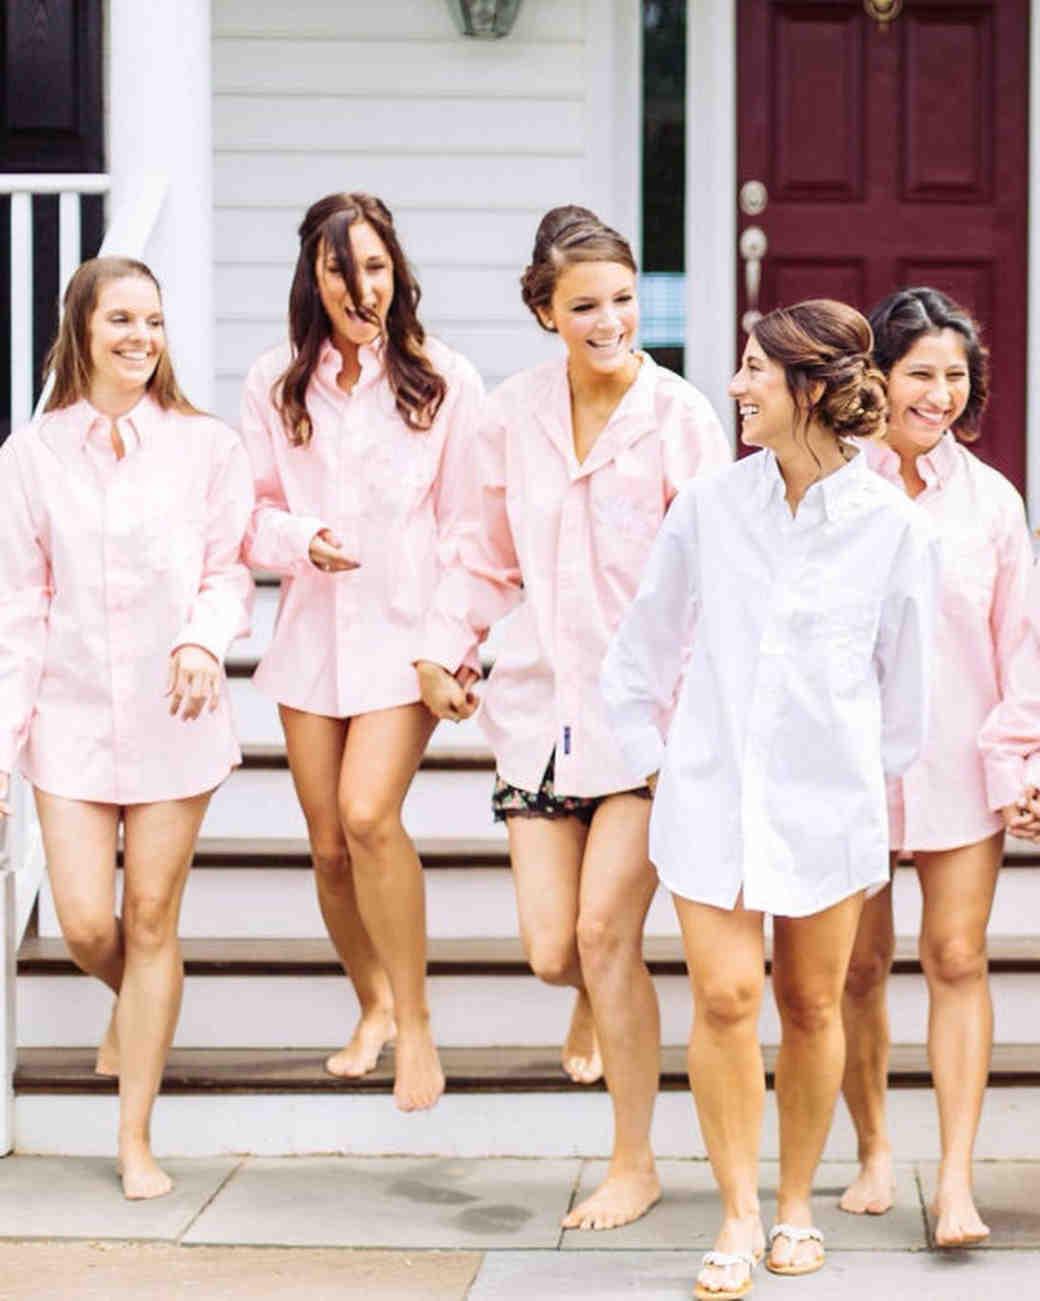 robe-alternatives-oversized-button-down-0716.jpg